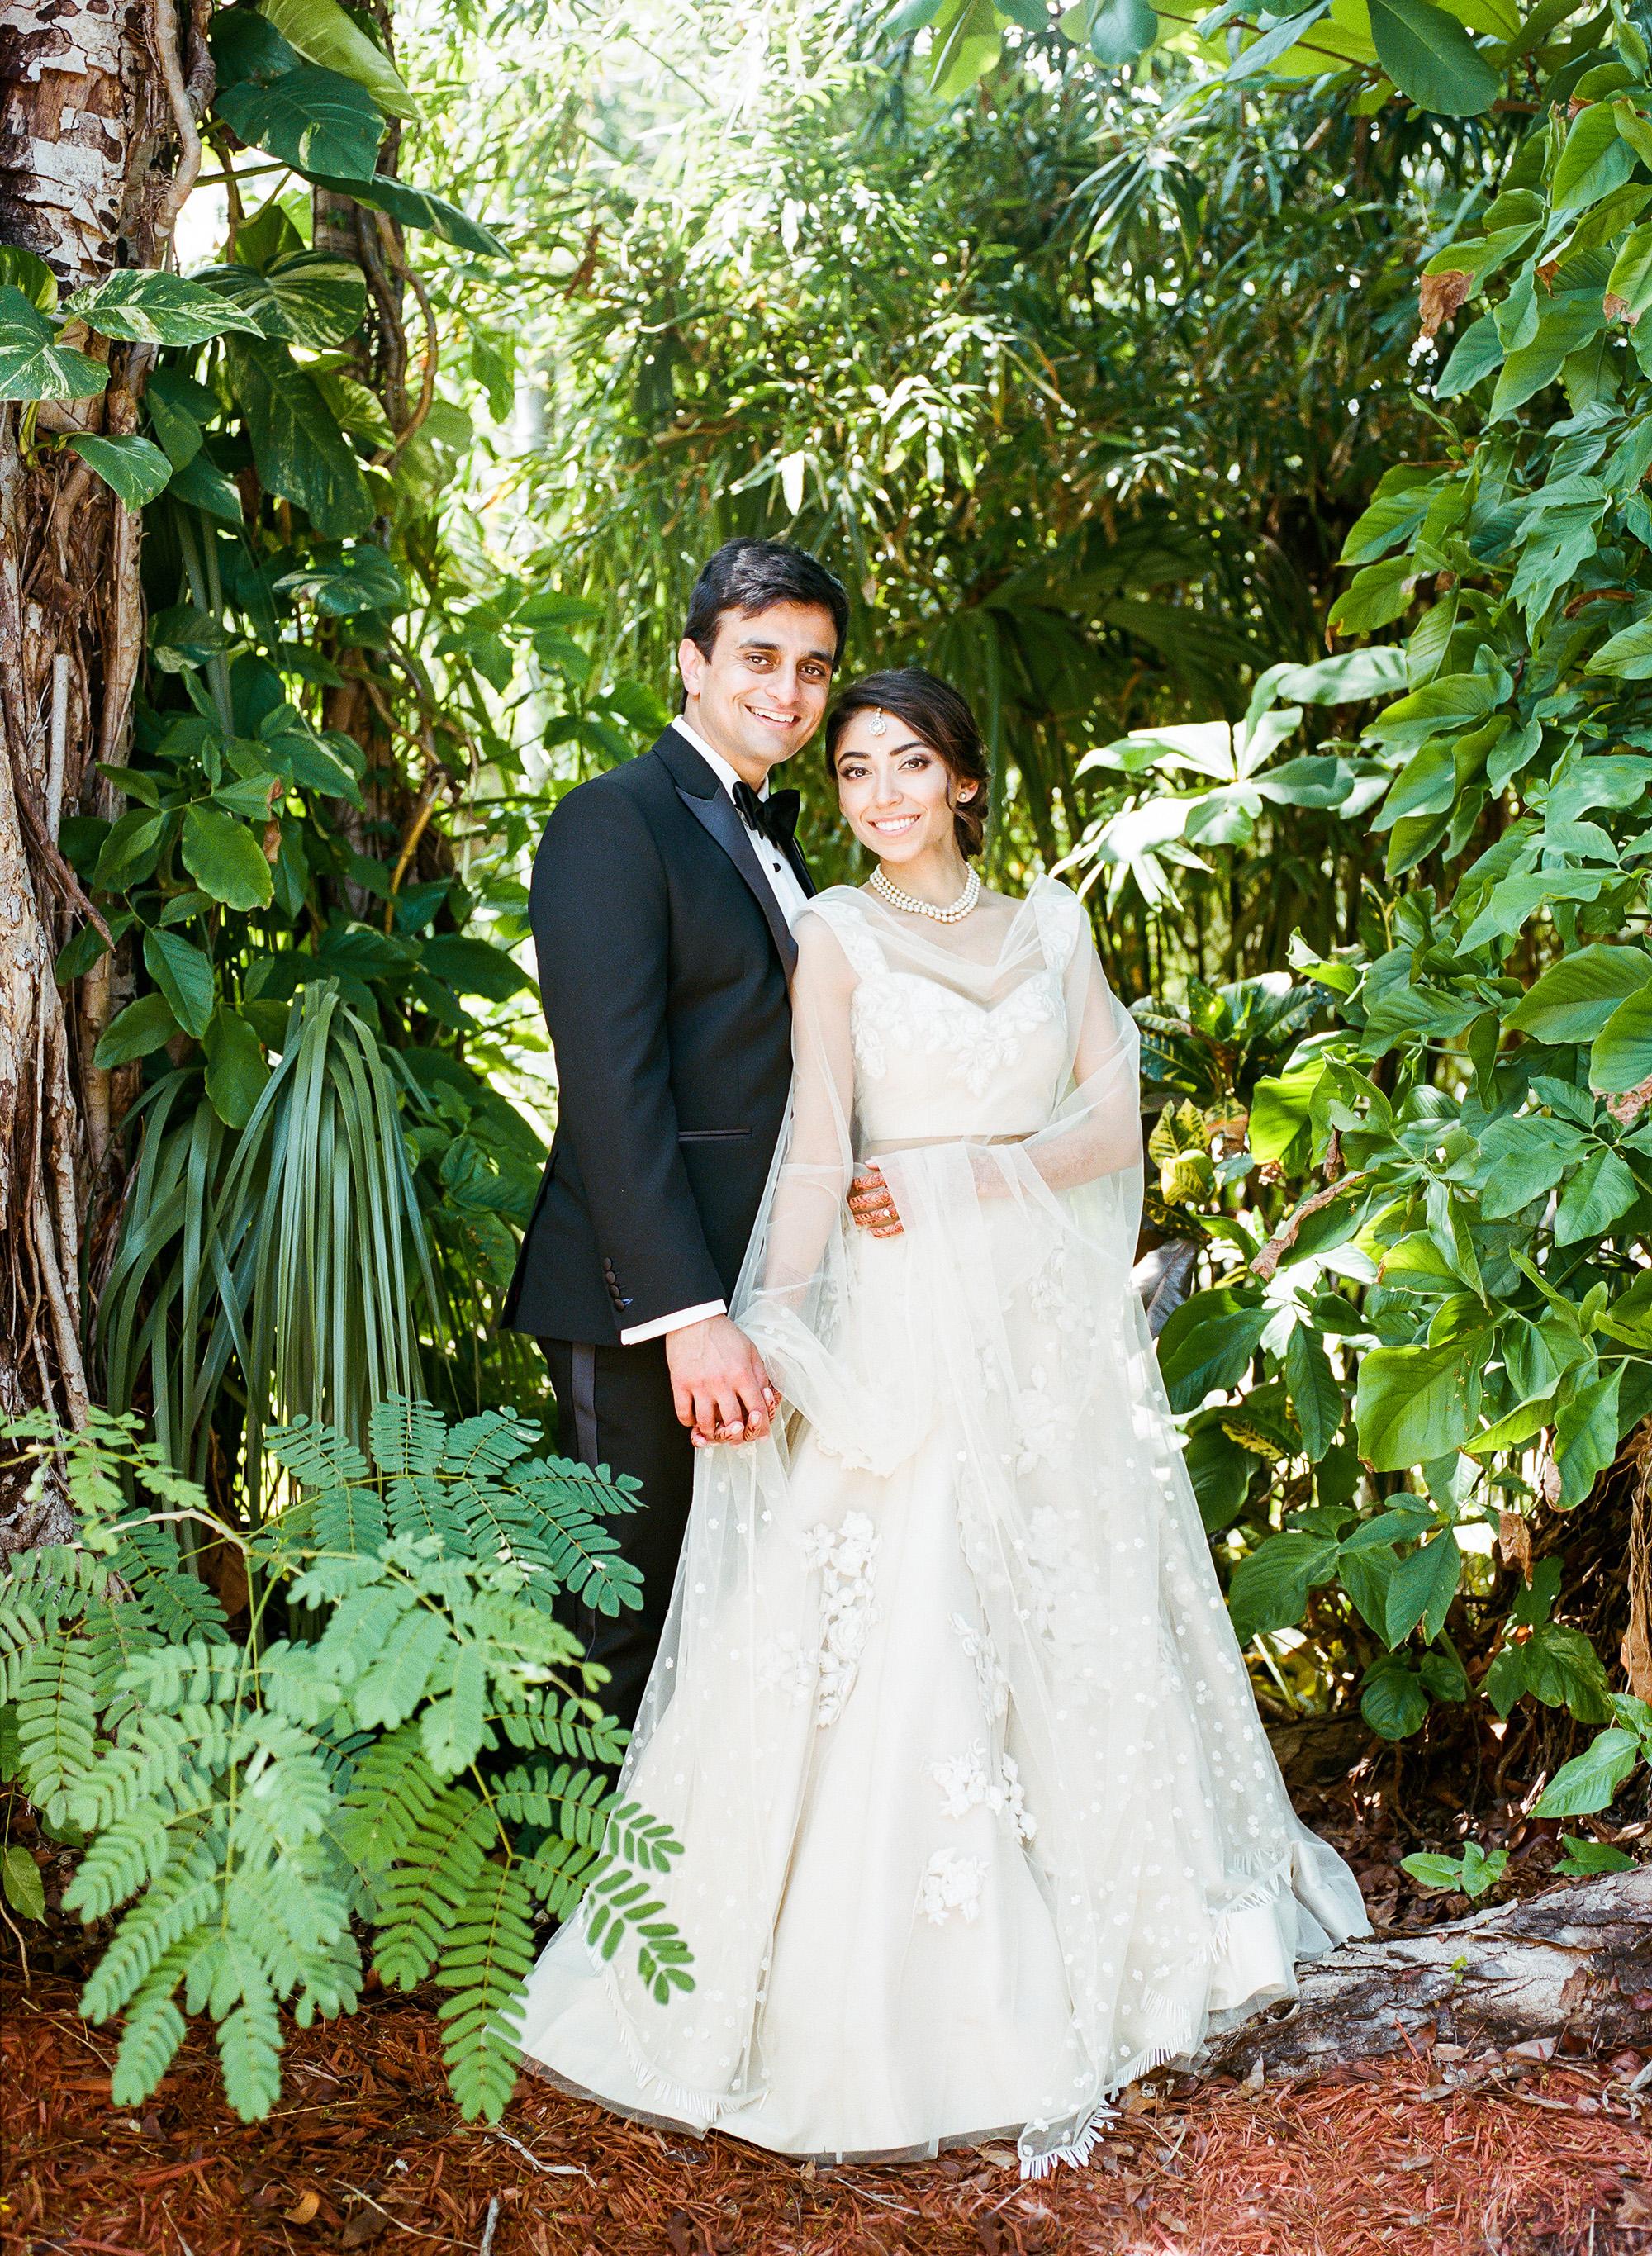 anuja nikhil wedding ceremony couple bride white dress